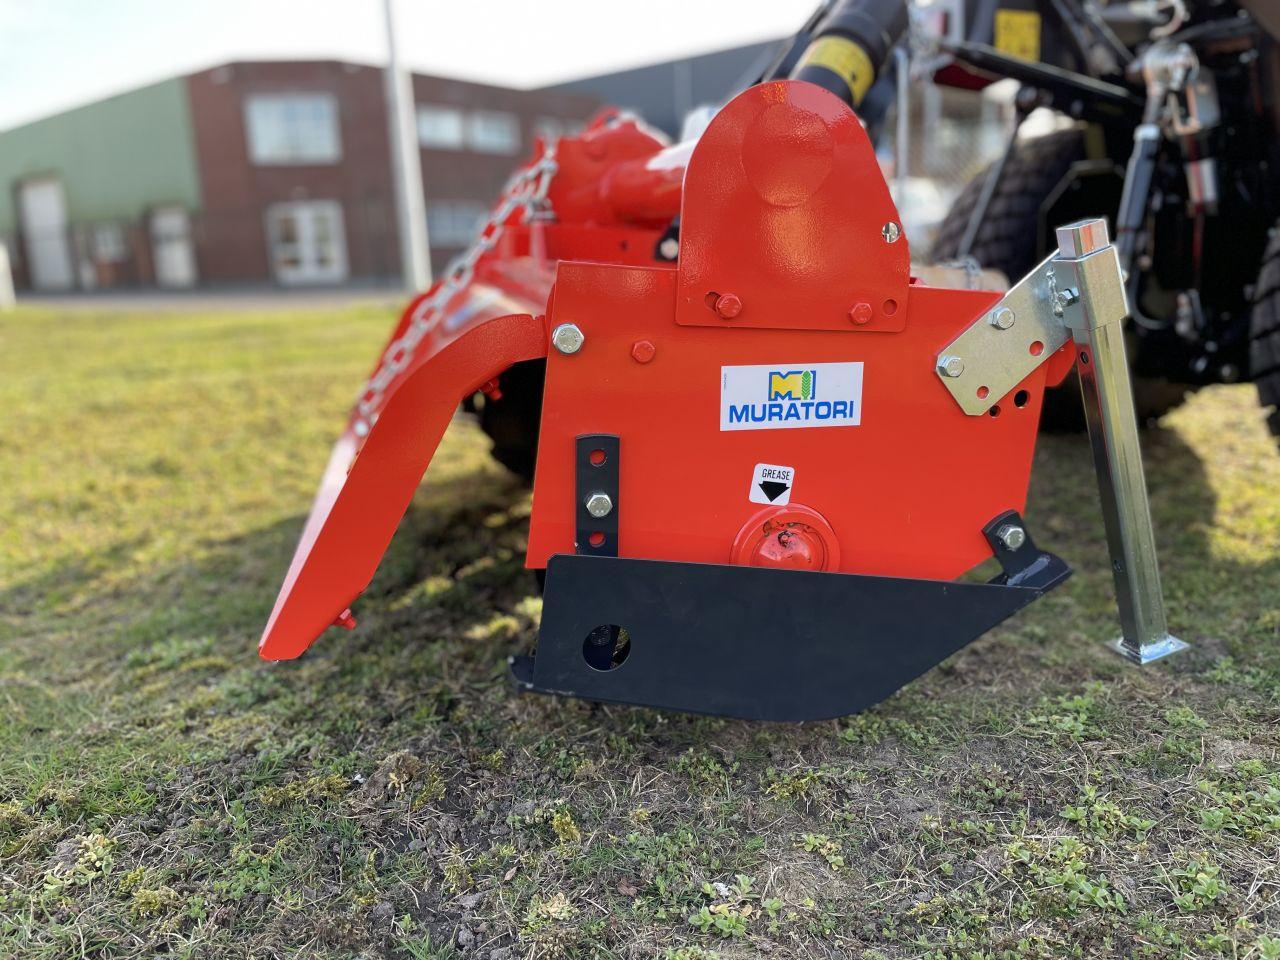 Muratori MZ4 125 zware grondfrees compact tractor